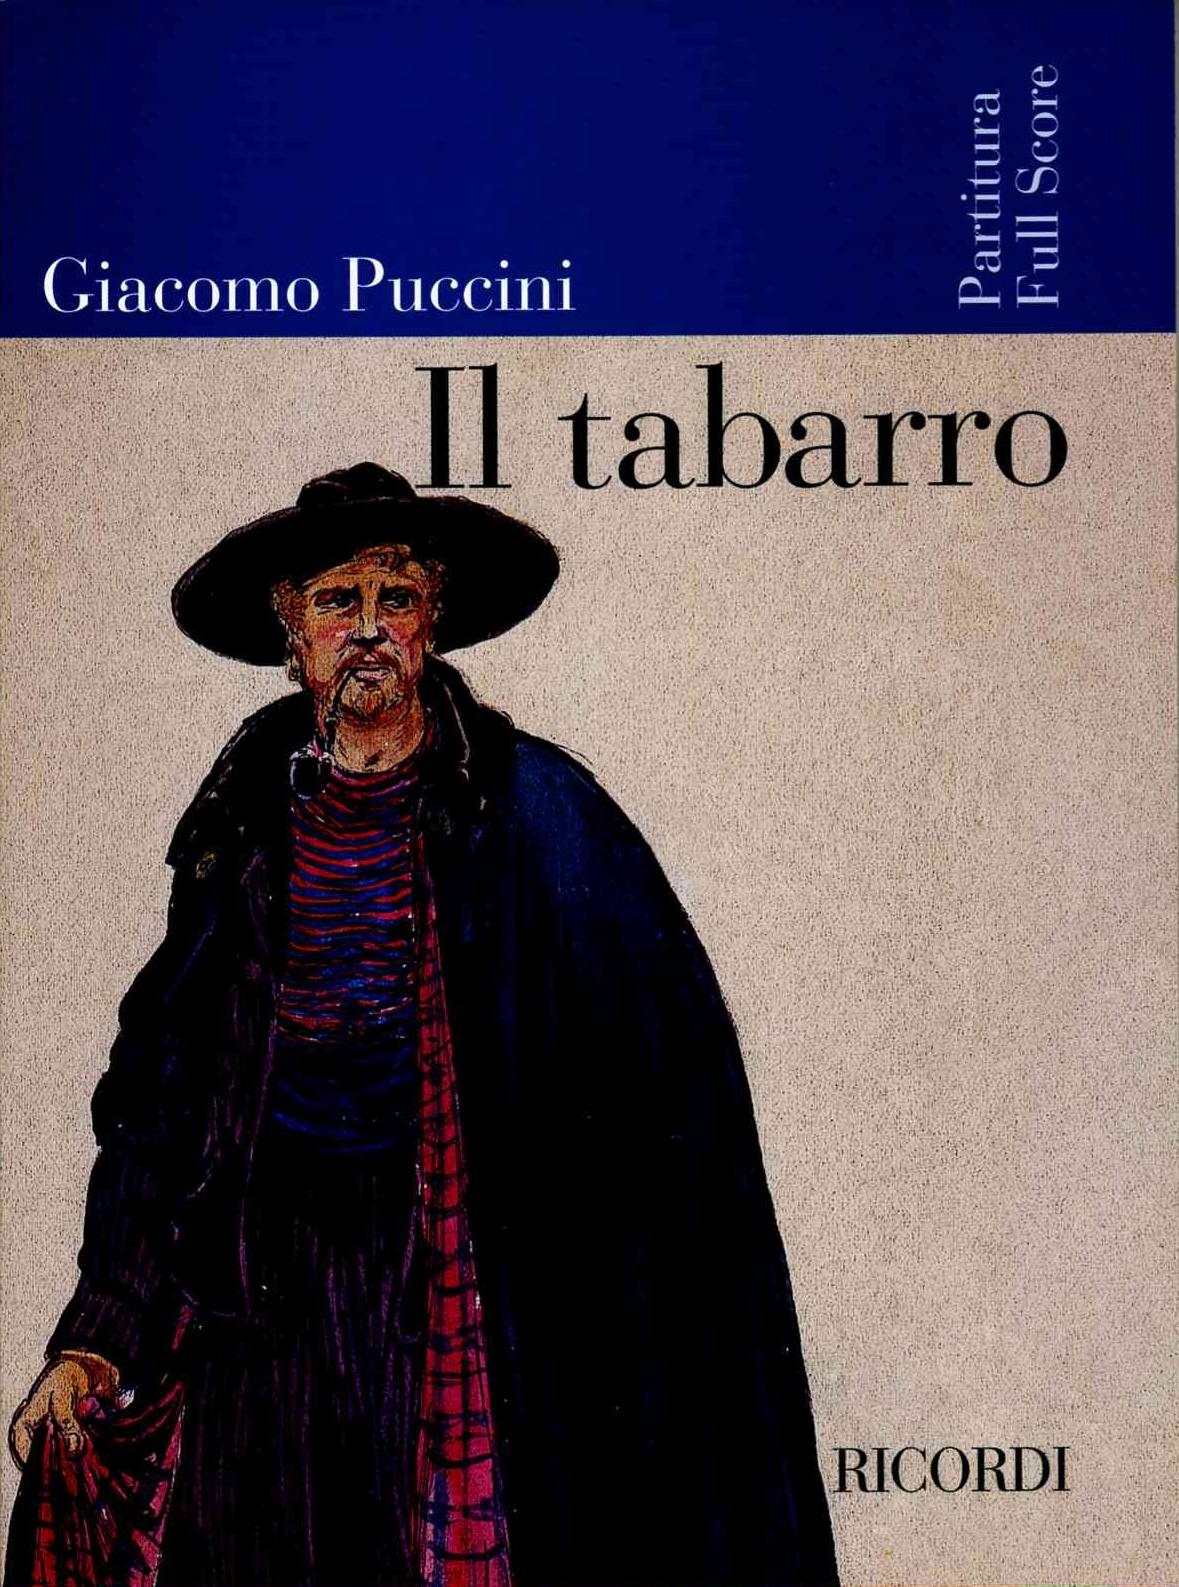 Giacomo Puccini: Il tabarro: Opera